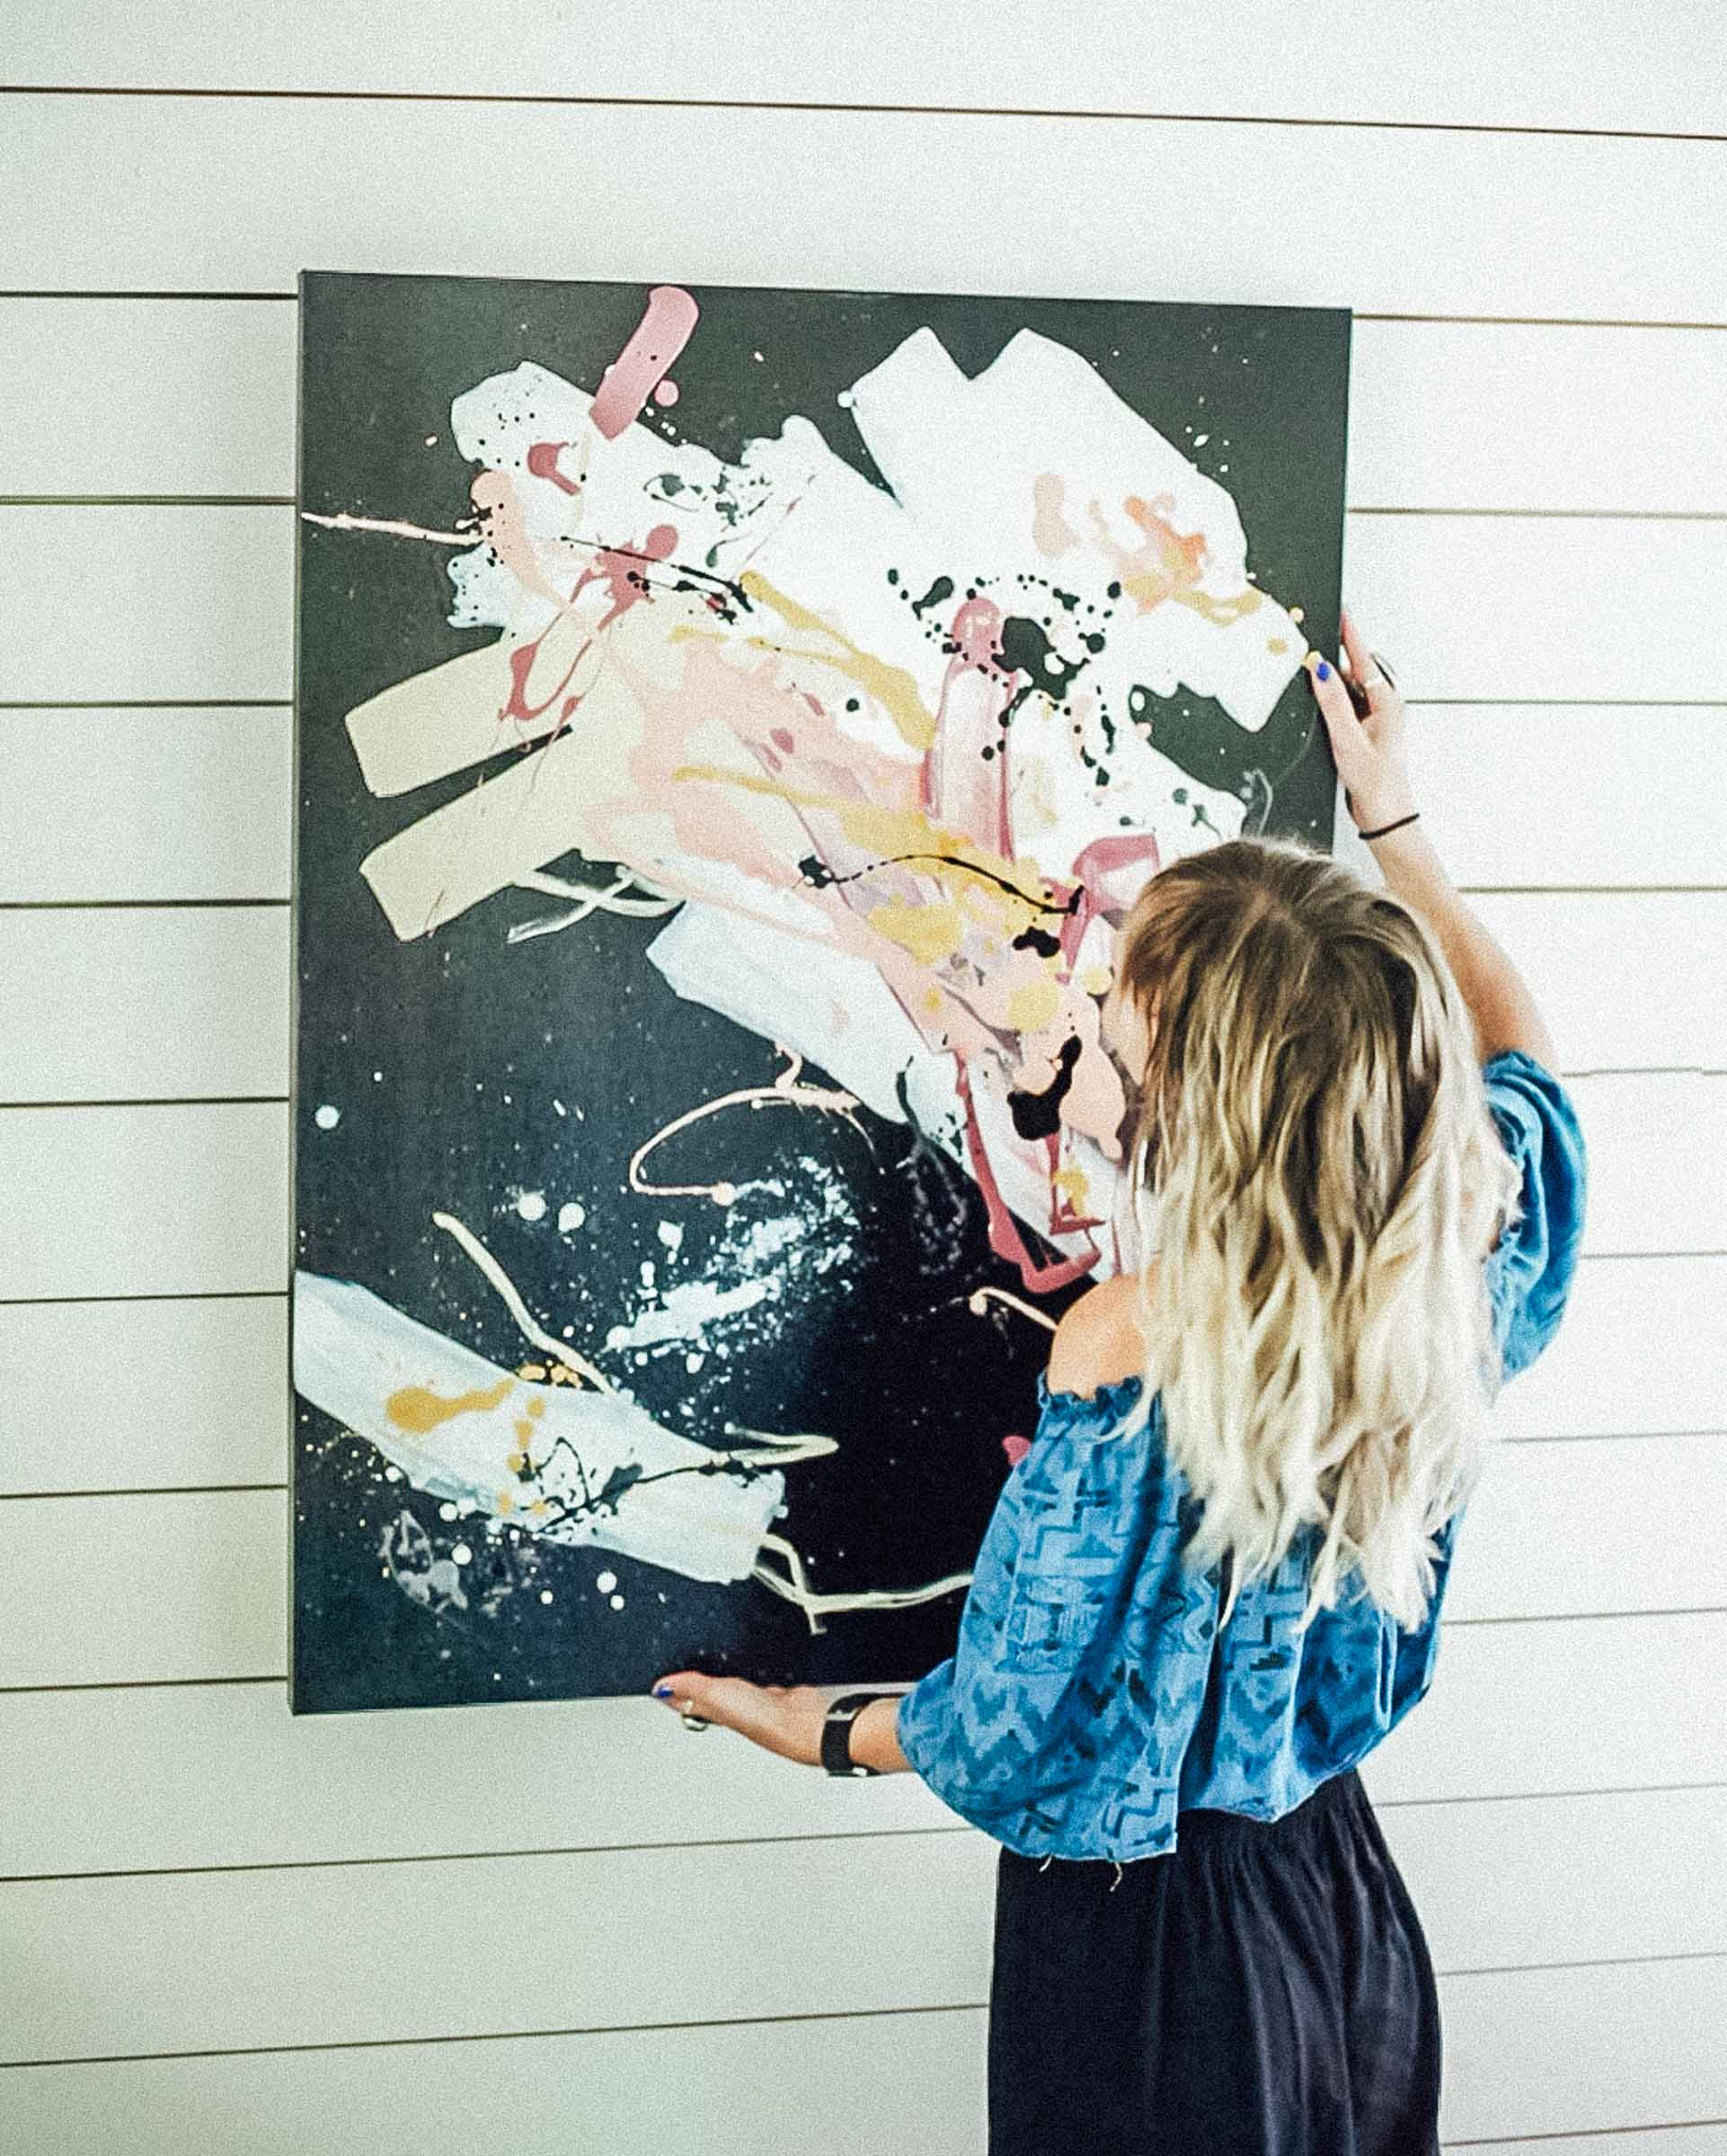 Chelsea_Michal_Garter_LightConversations_LightGalleryGR_GrandRapids_ArtsPodcast-9.jpg